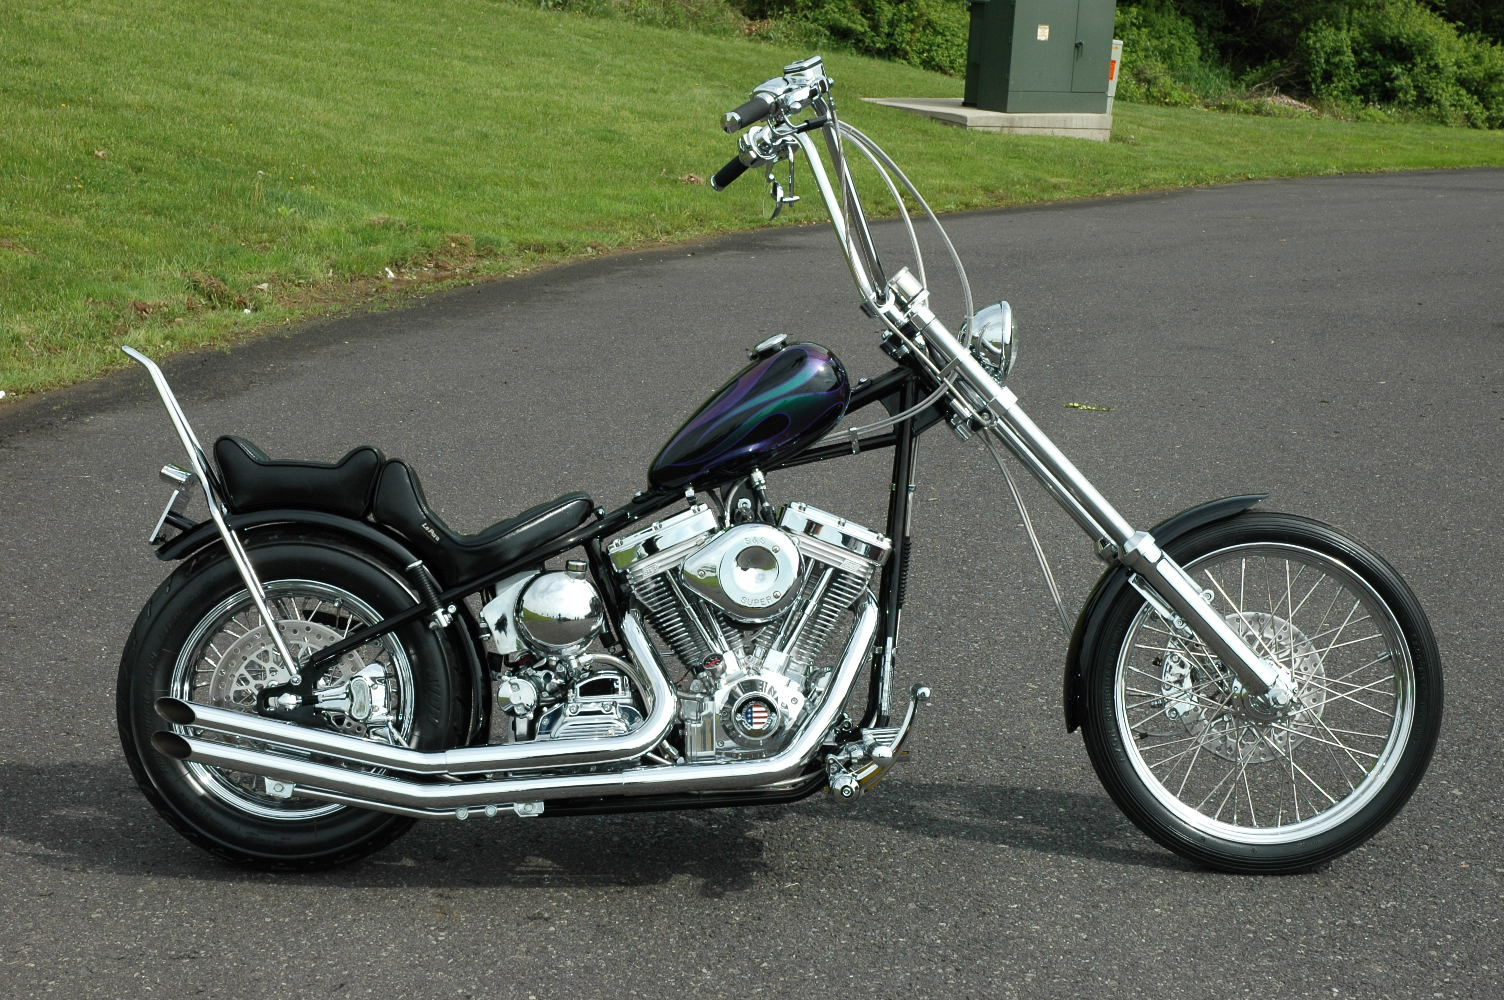 Easyrider 4 Up Rigid Frame Rolling Chassis Bike Kit Harley Custom ...